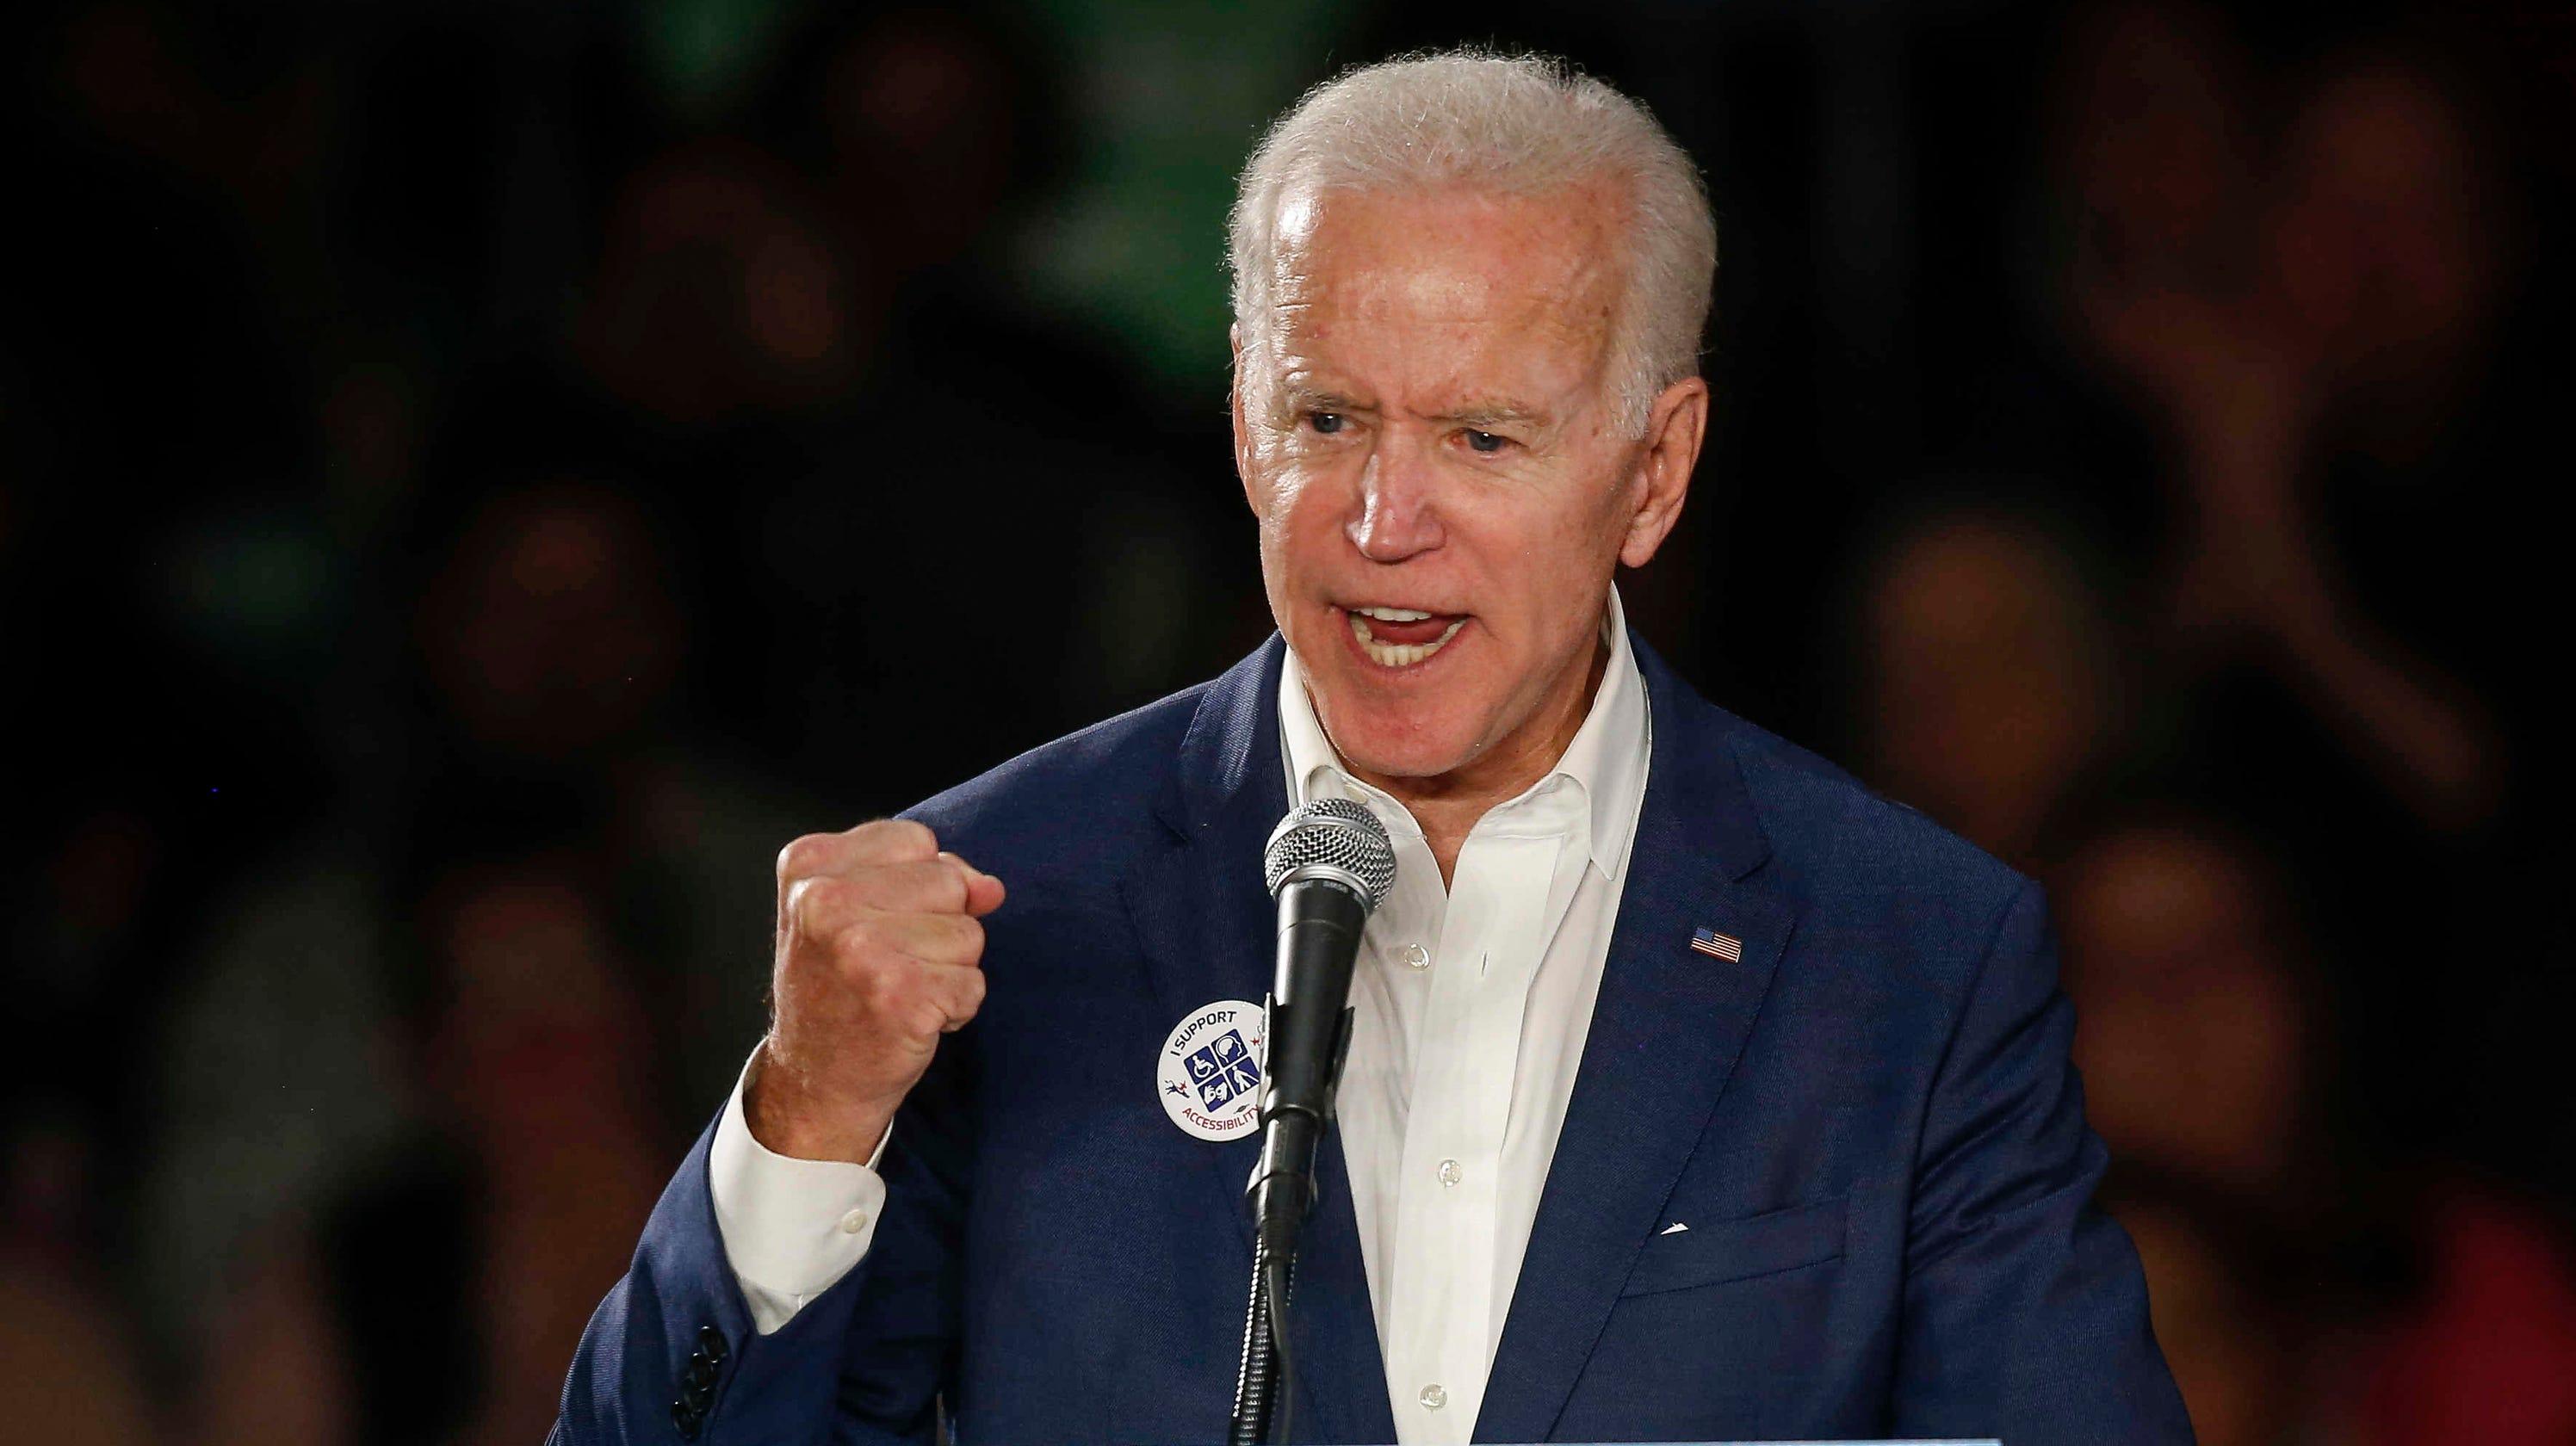 Joe Biden told moving military story at campaign stop ...  |Joe Biden